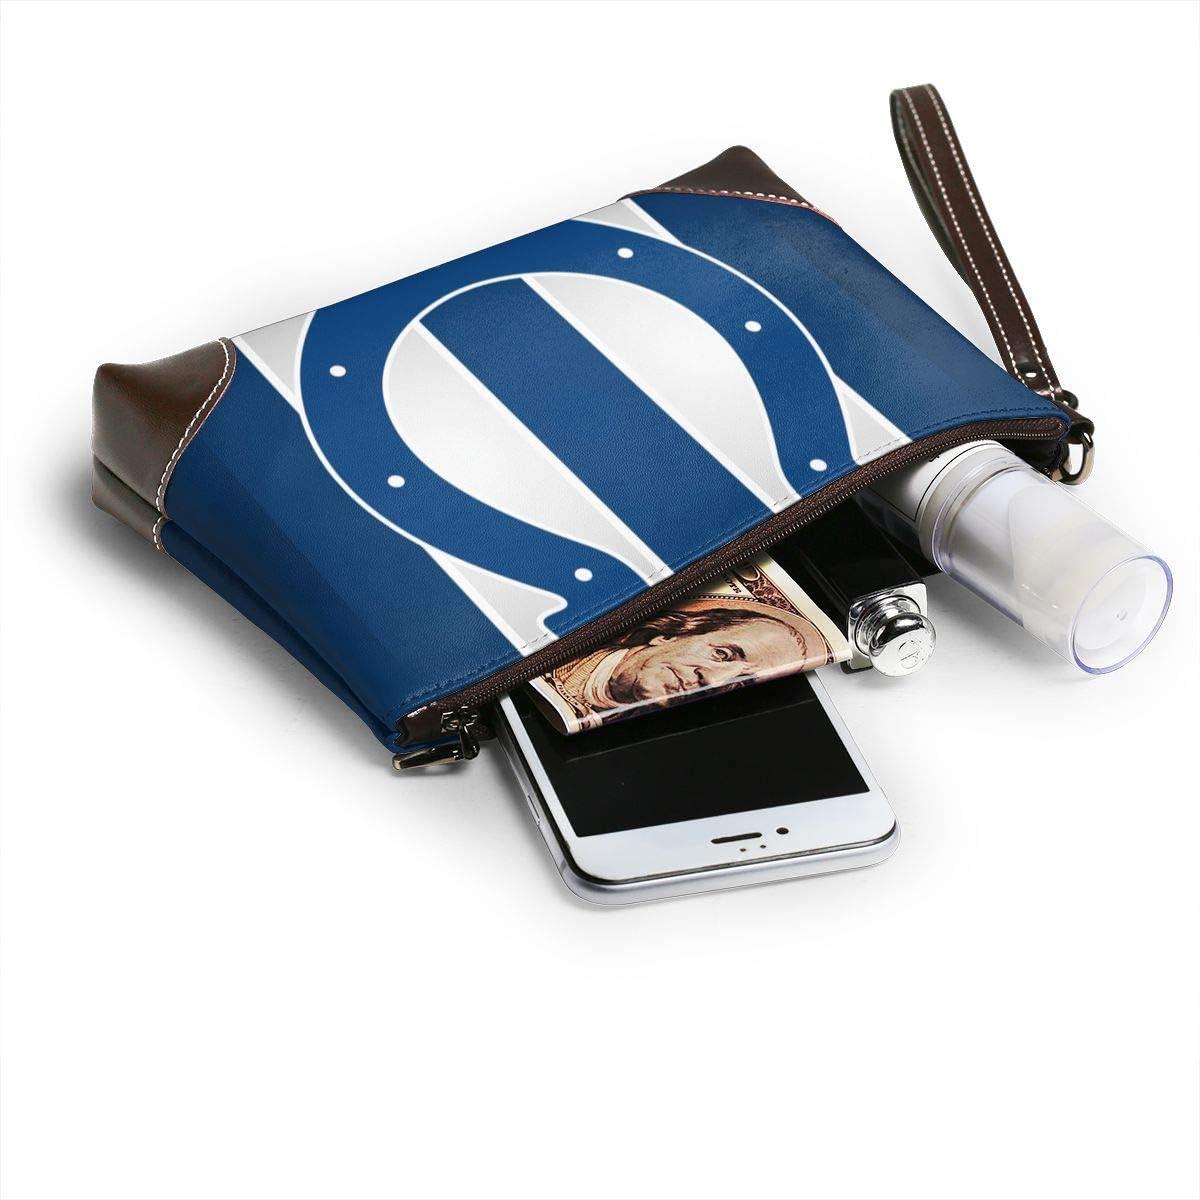 Briefcase Soft Leather Wrist Strap Clutch with Zipper ALHOKLAus 1 Fashionable Leather Clutch Portable Handbag